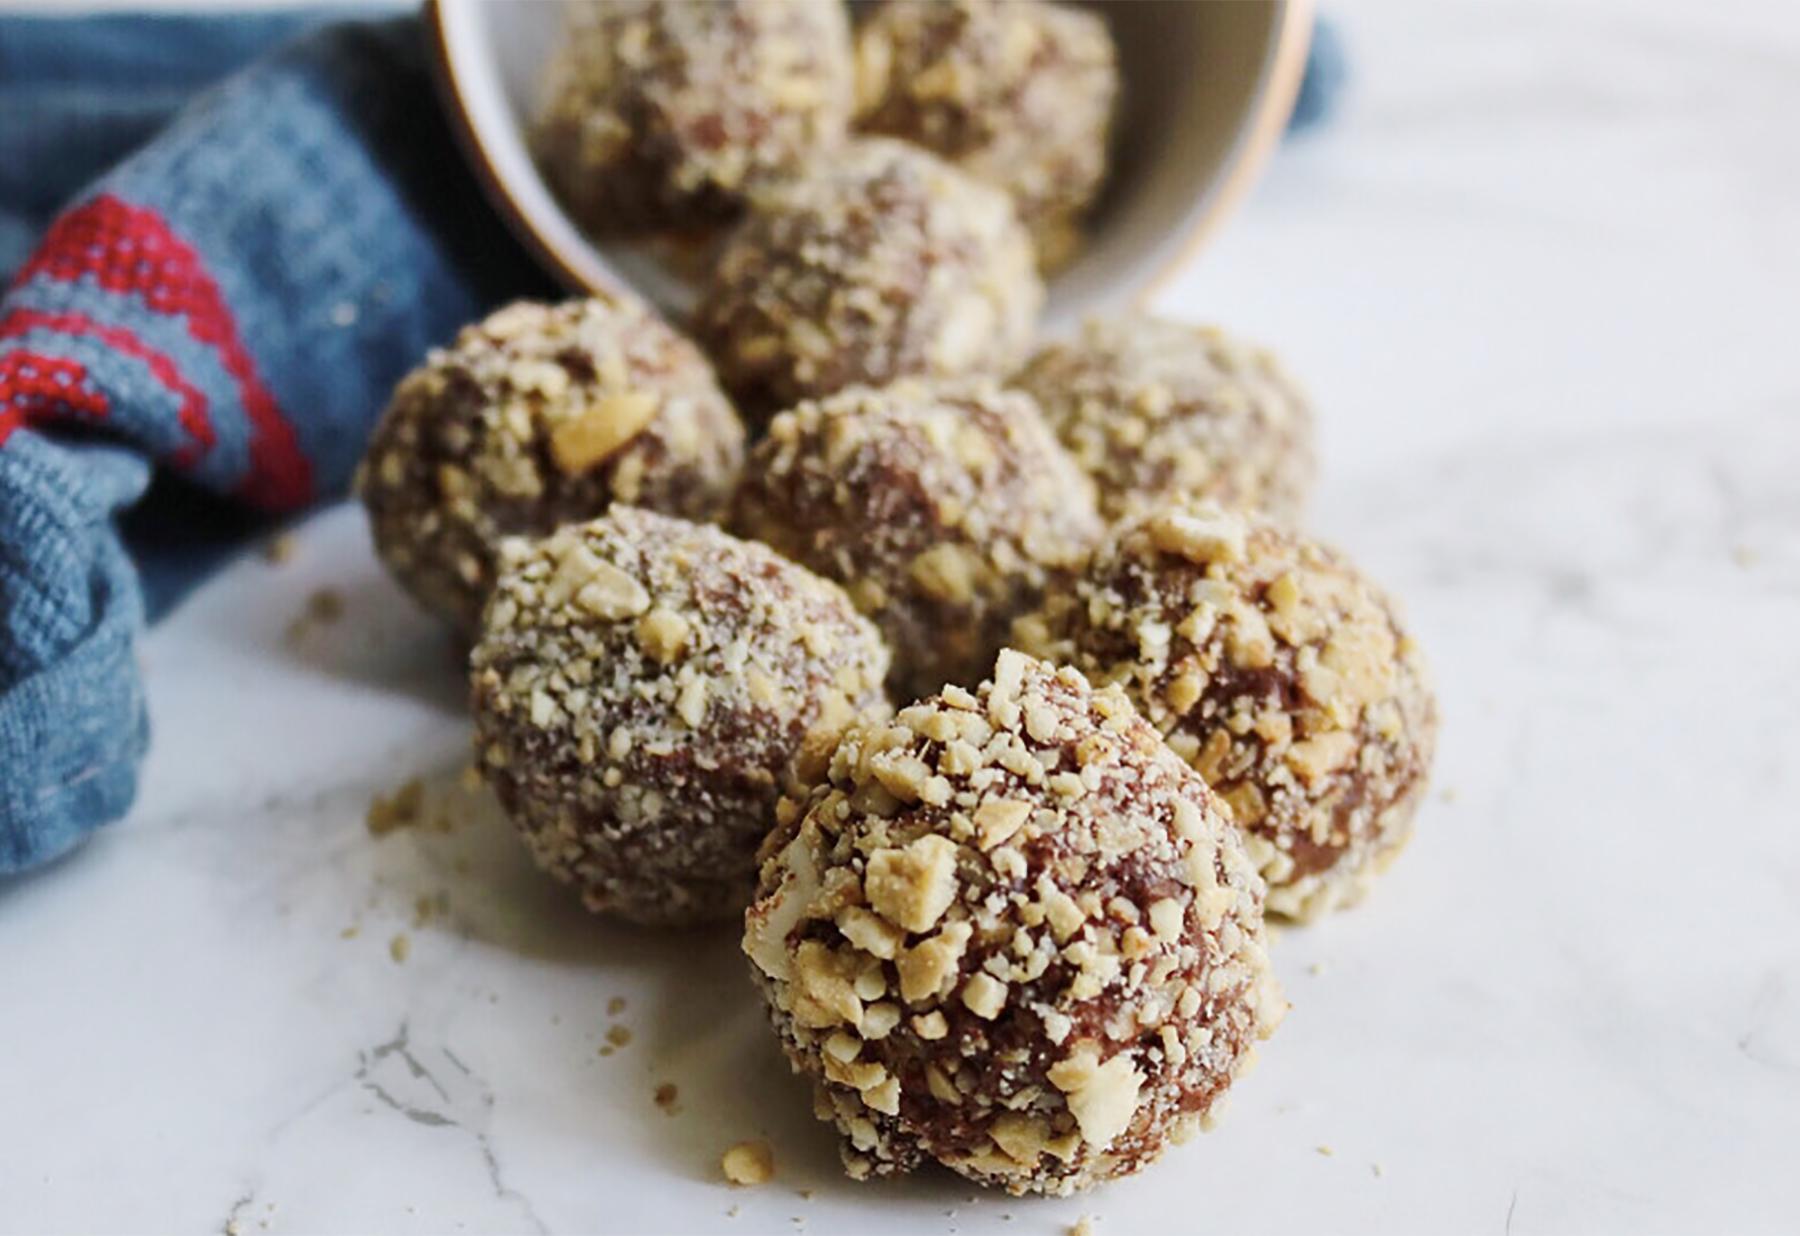 Keto Snacks That Take Care Of Comfort Food Cravings Greatist